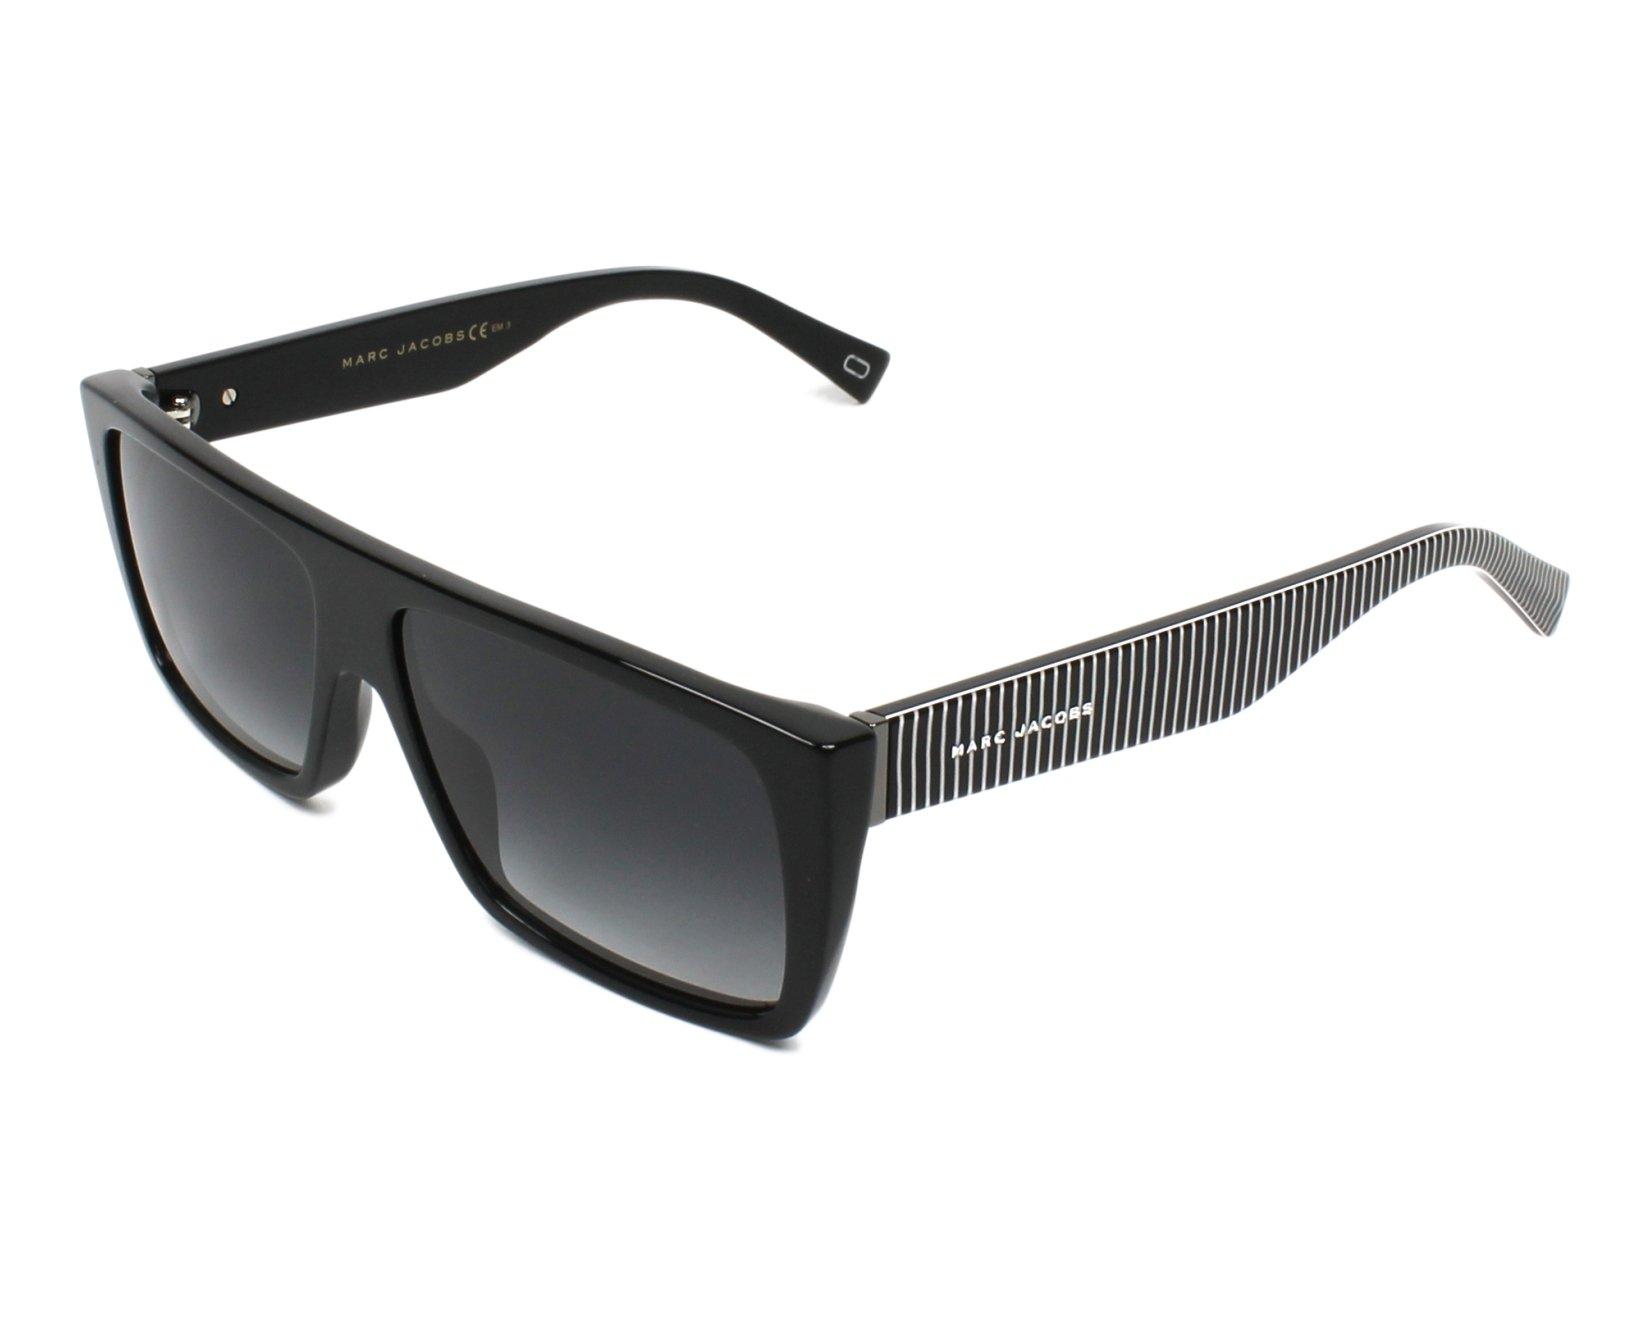 MARC JACOBS Marc Jacobs Sonnenbrille » MARC ICON 096/S«, schwarz, 807/9O - schwarz/grau